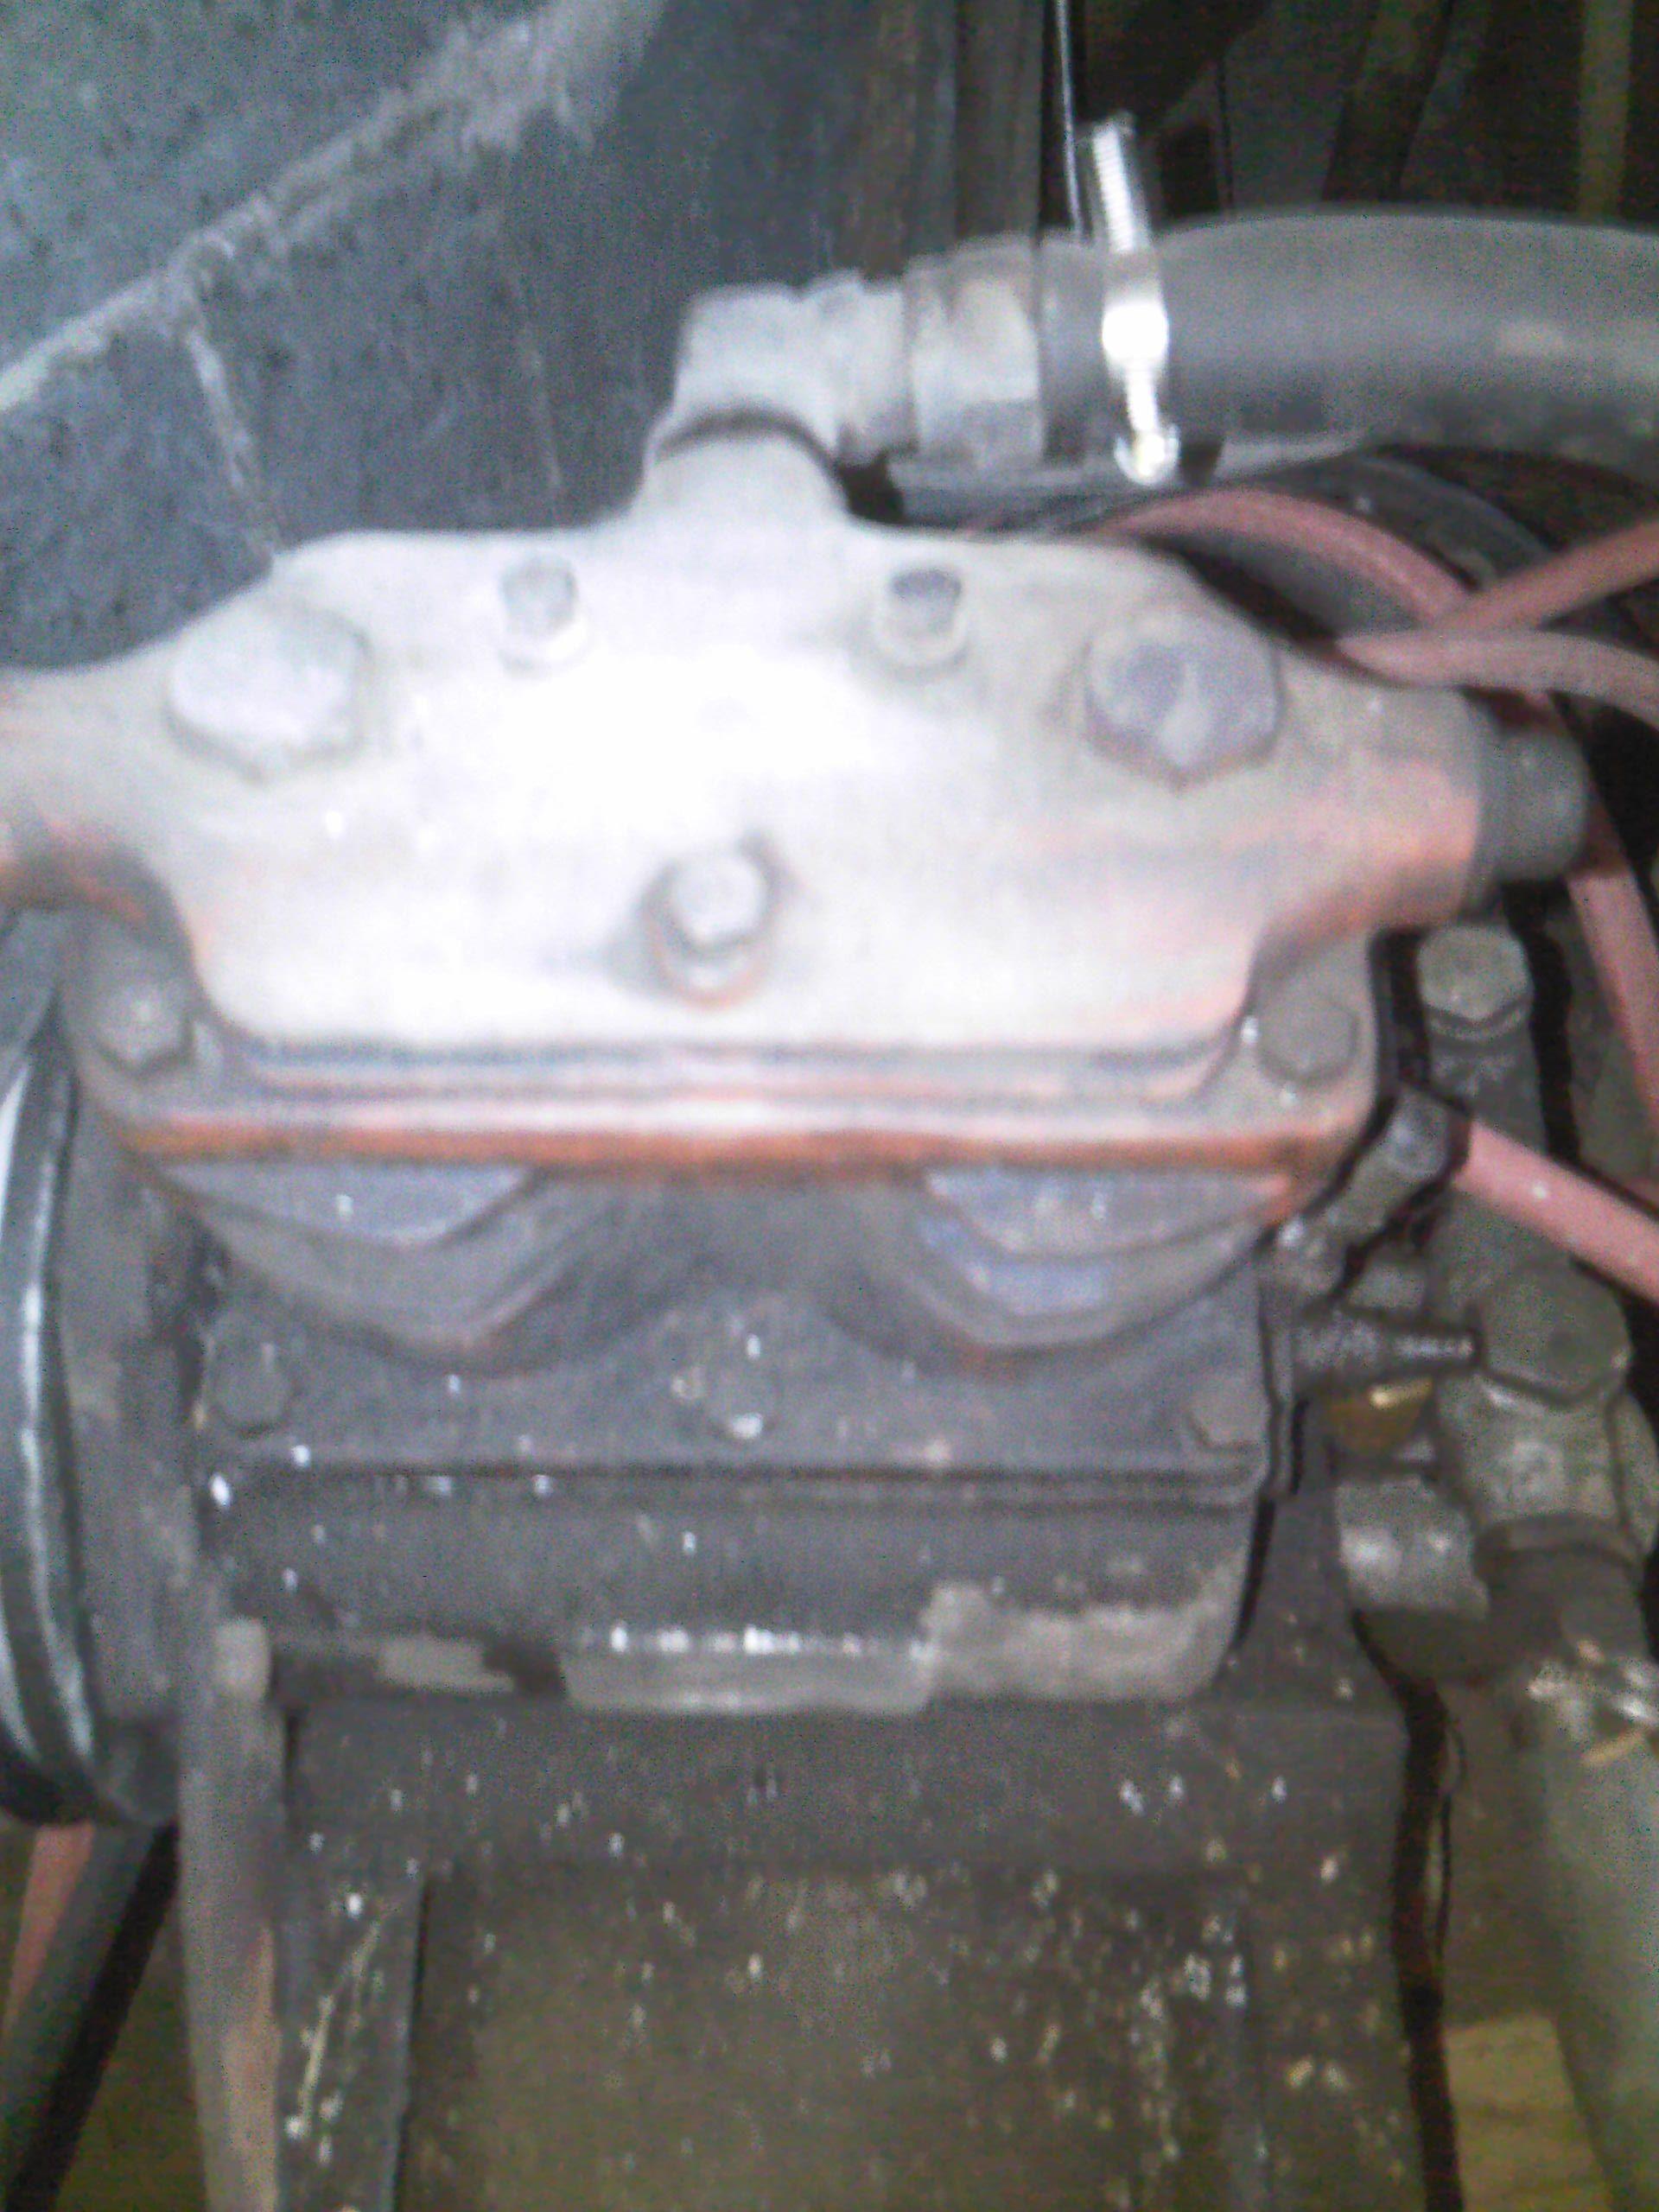 identyfikacja spr�arki do kompresora